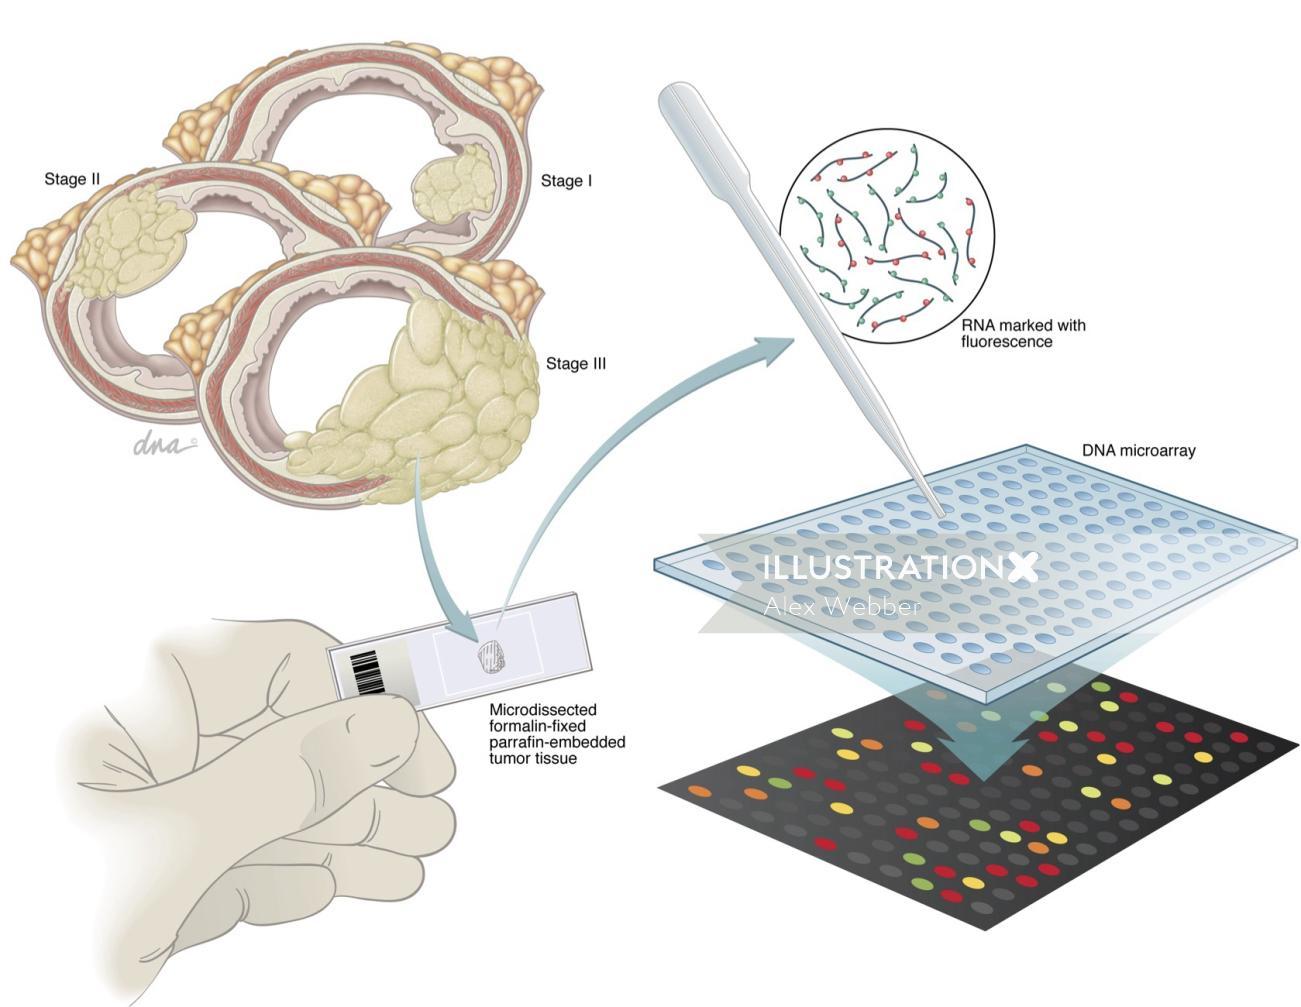 DNA microarray technical illustration